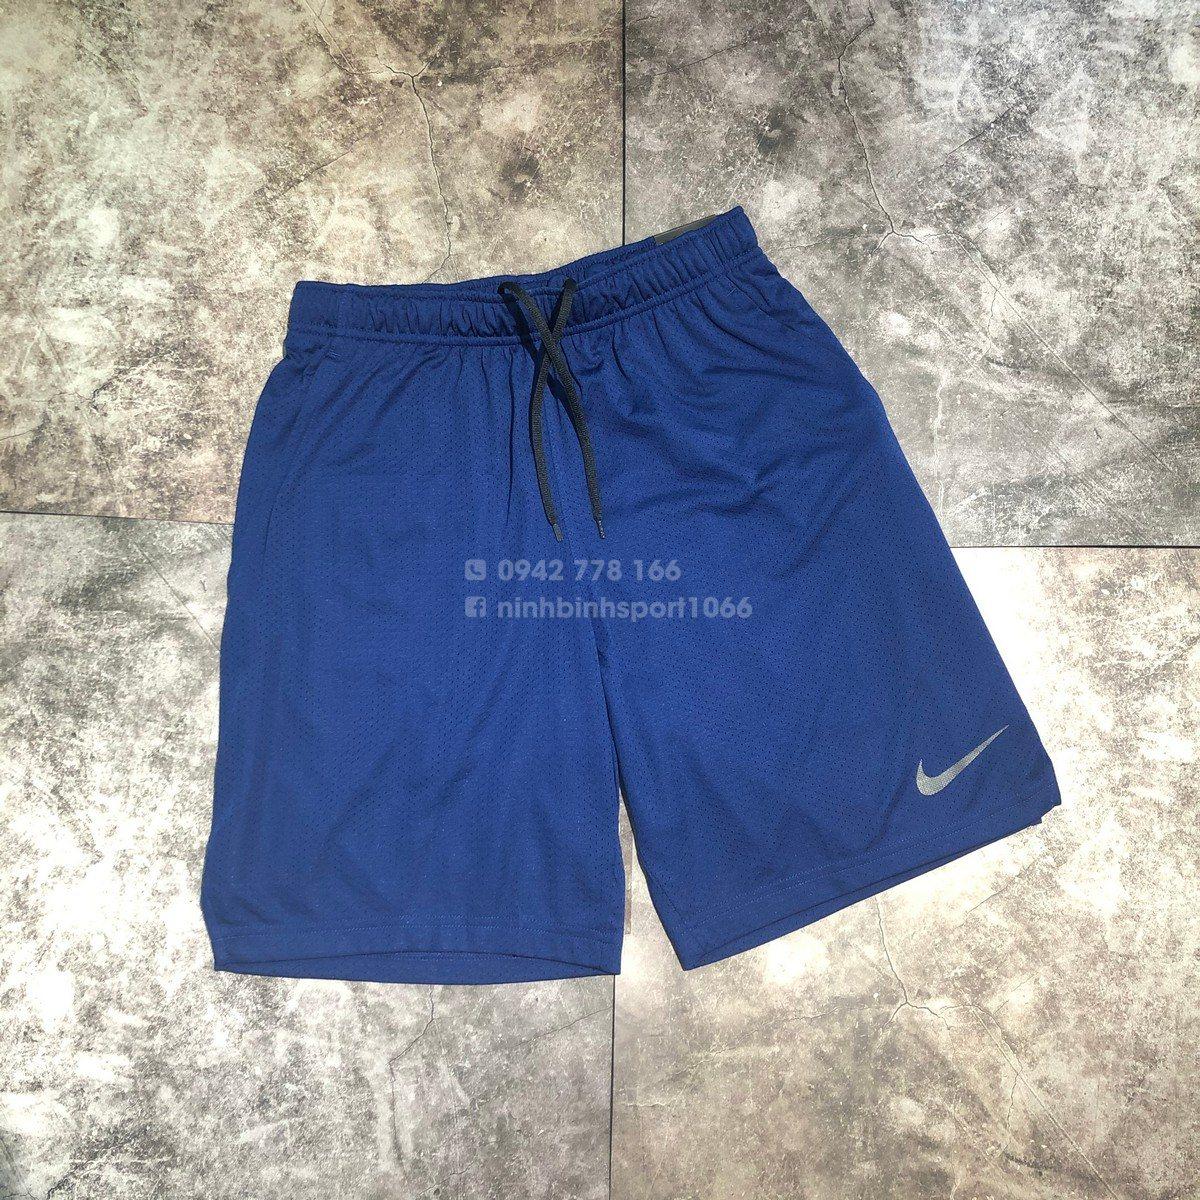 Quần Thể Thao nam Nike AS M NK SHORT MNSTR MESH 4.0 927546-478